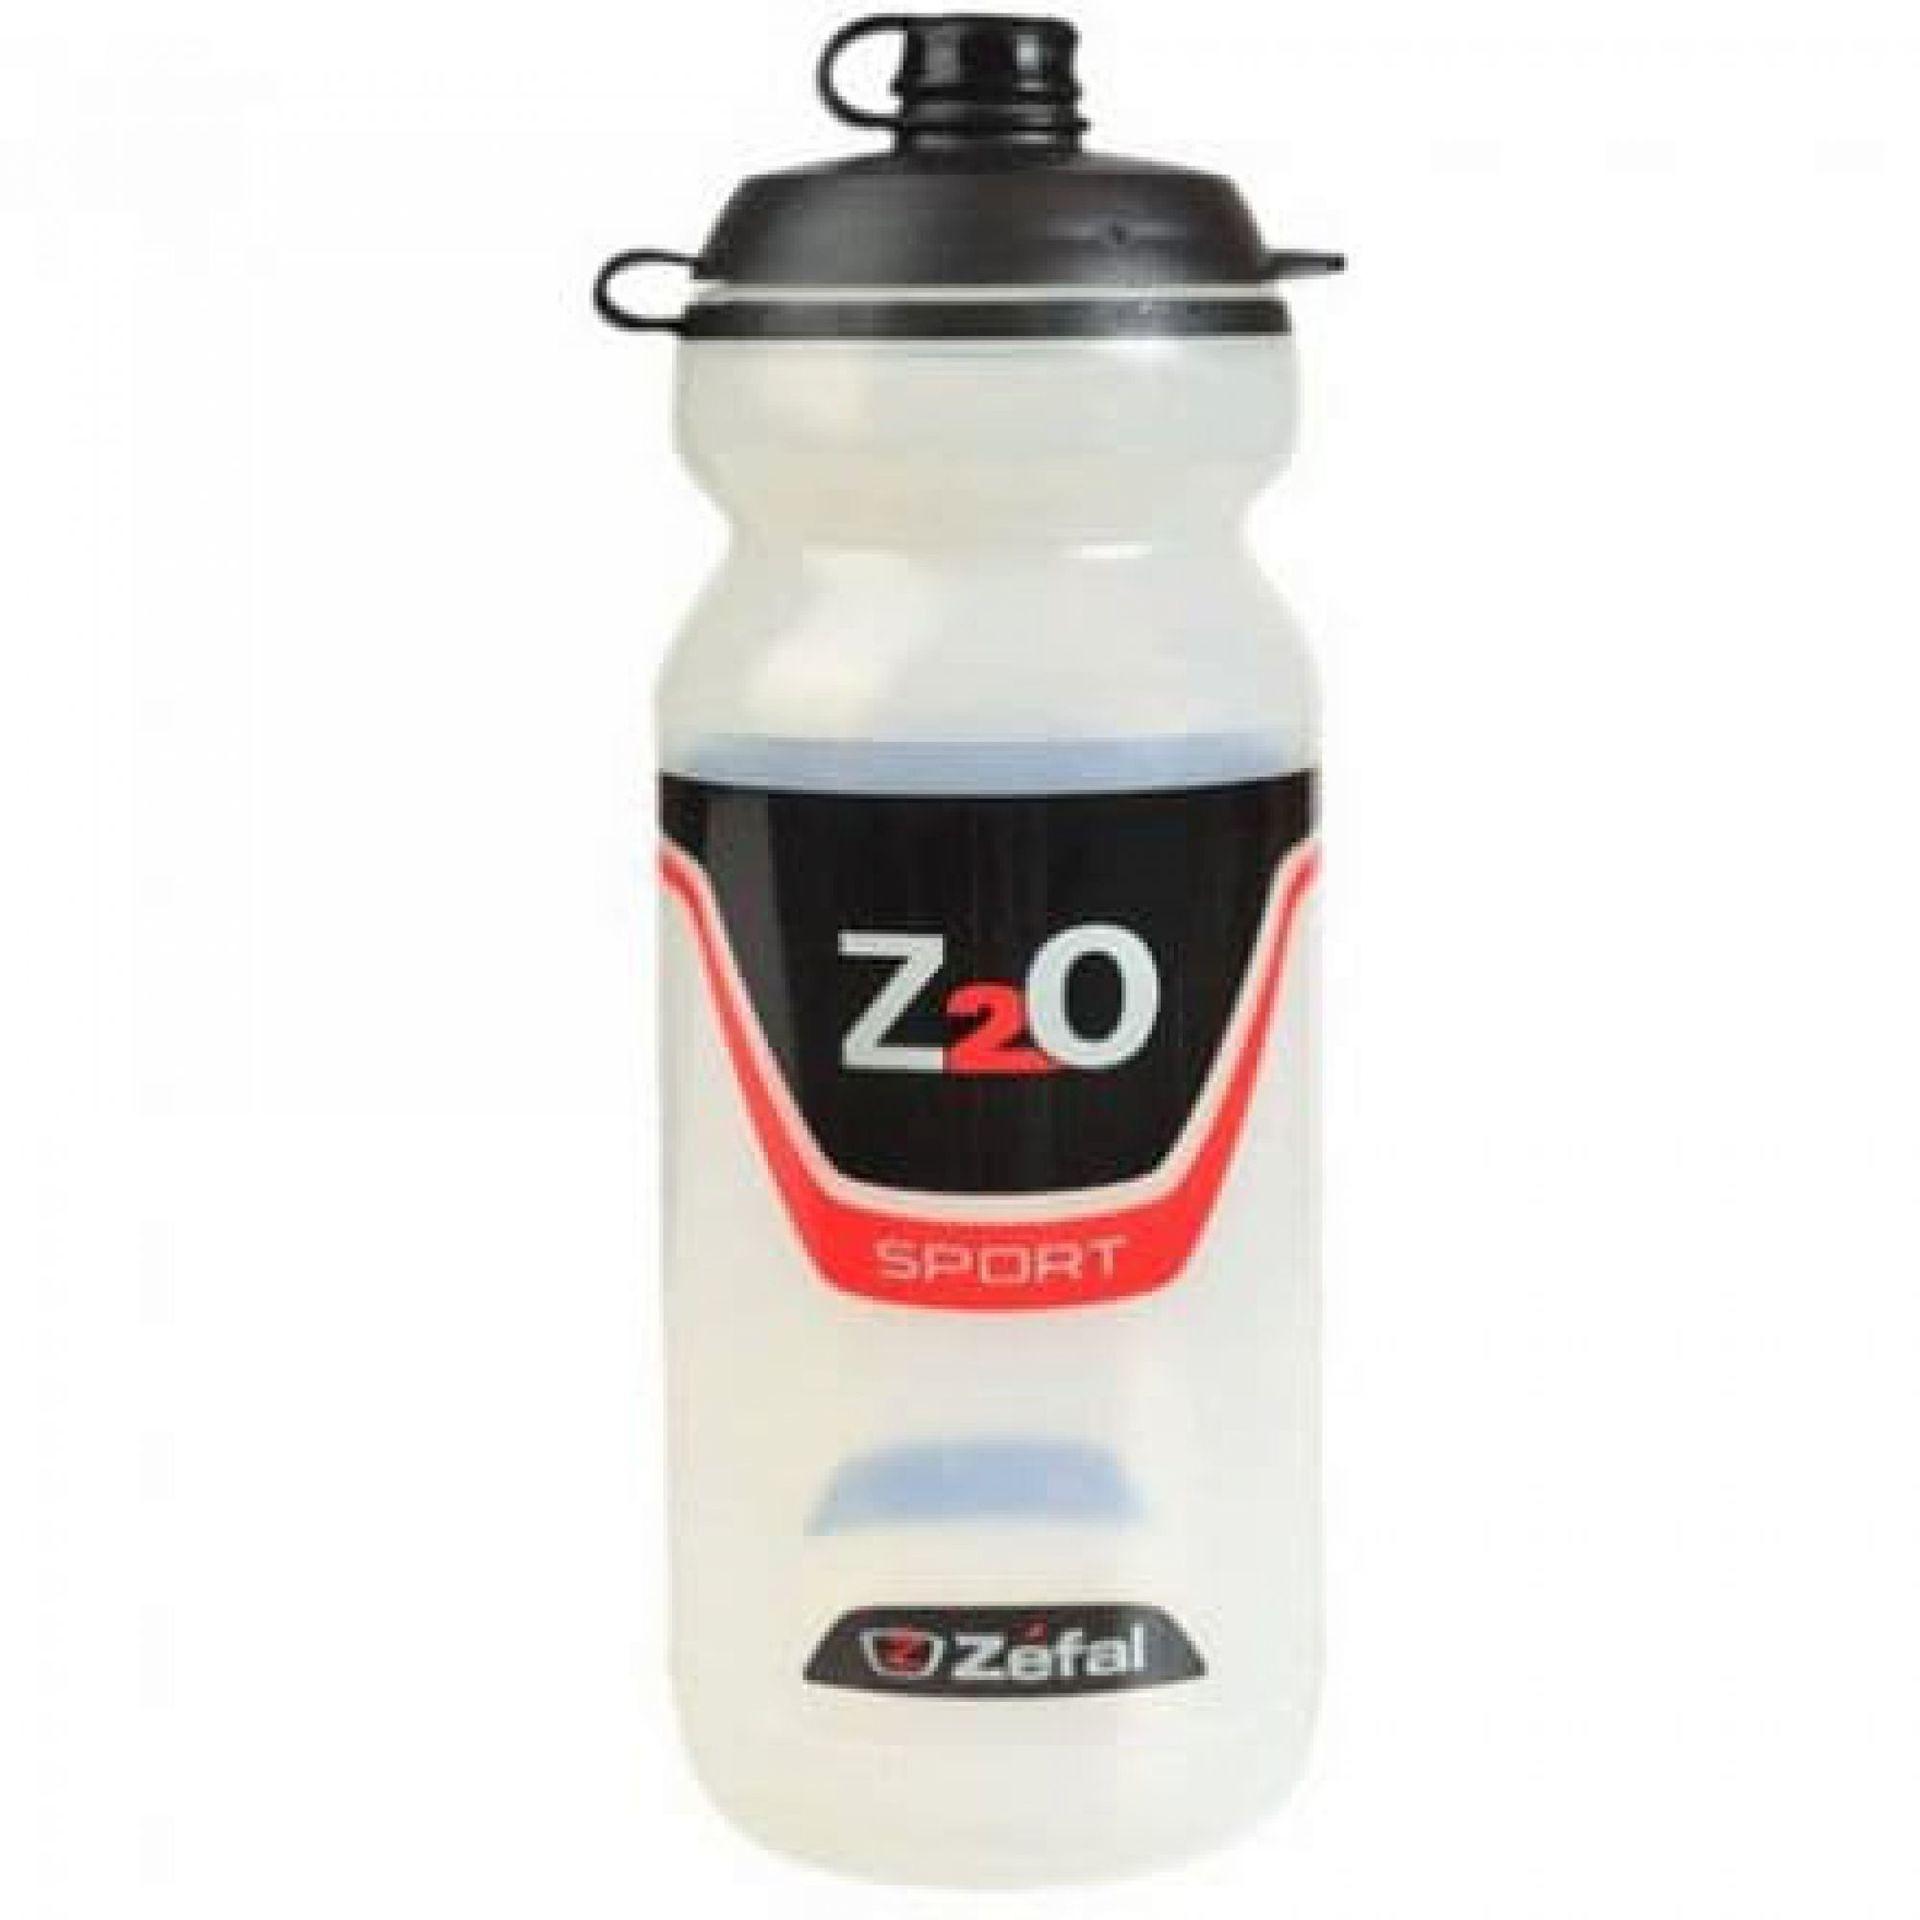 BIDON ROWEROWY ZEFAL Z20 60